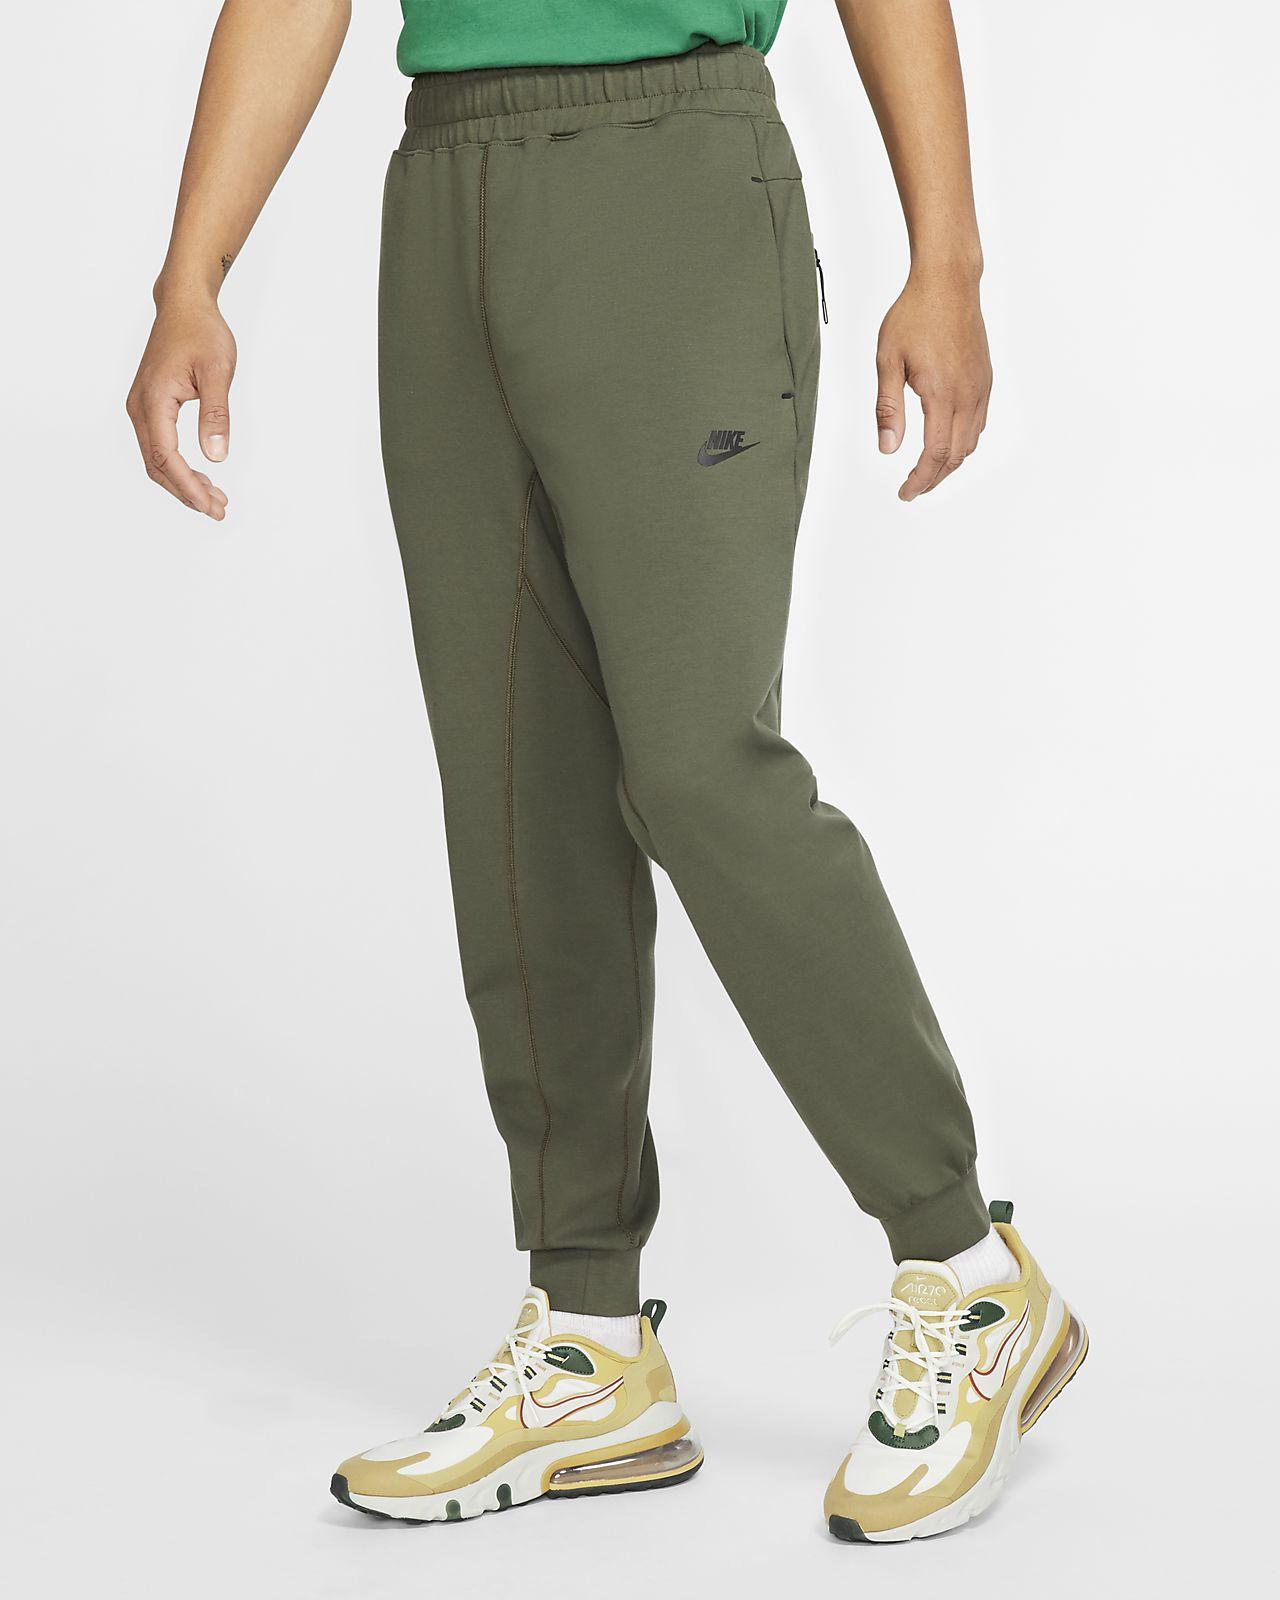 Pantaloni Donna | Nike LEGGINGS Nero « Shop Hitech